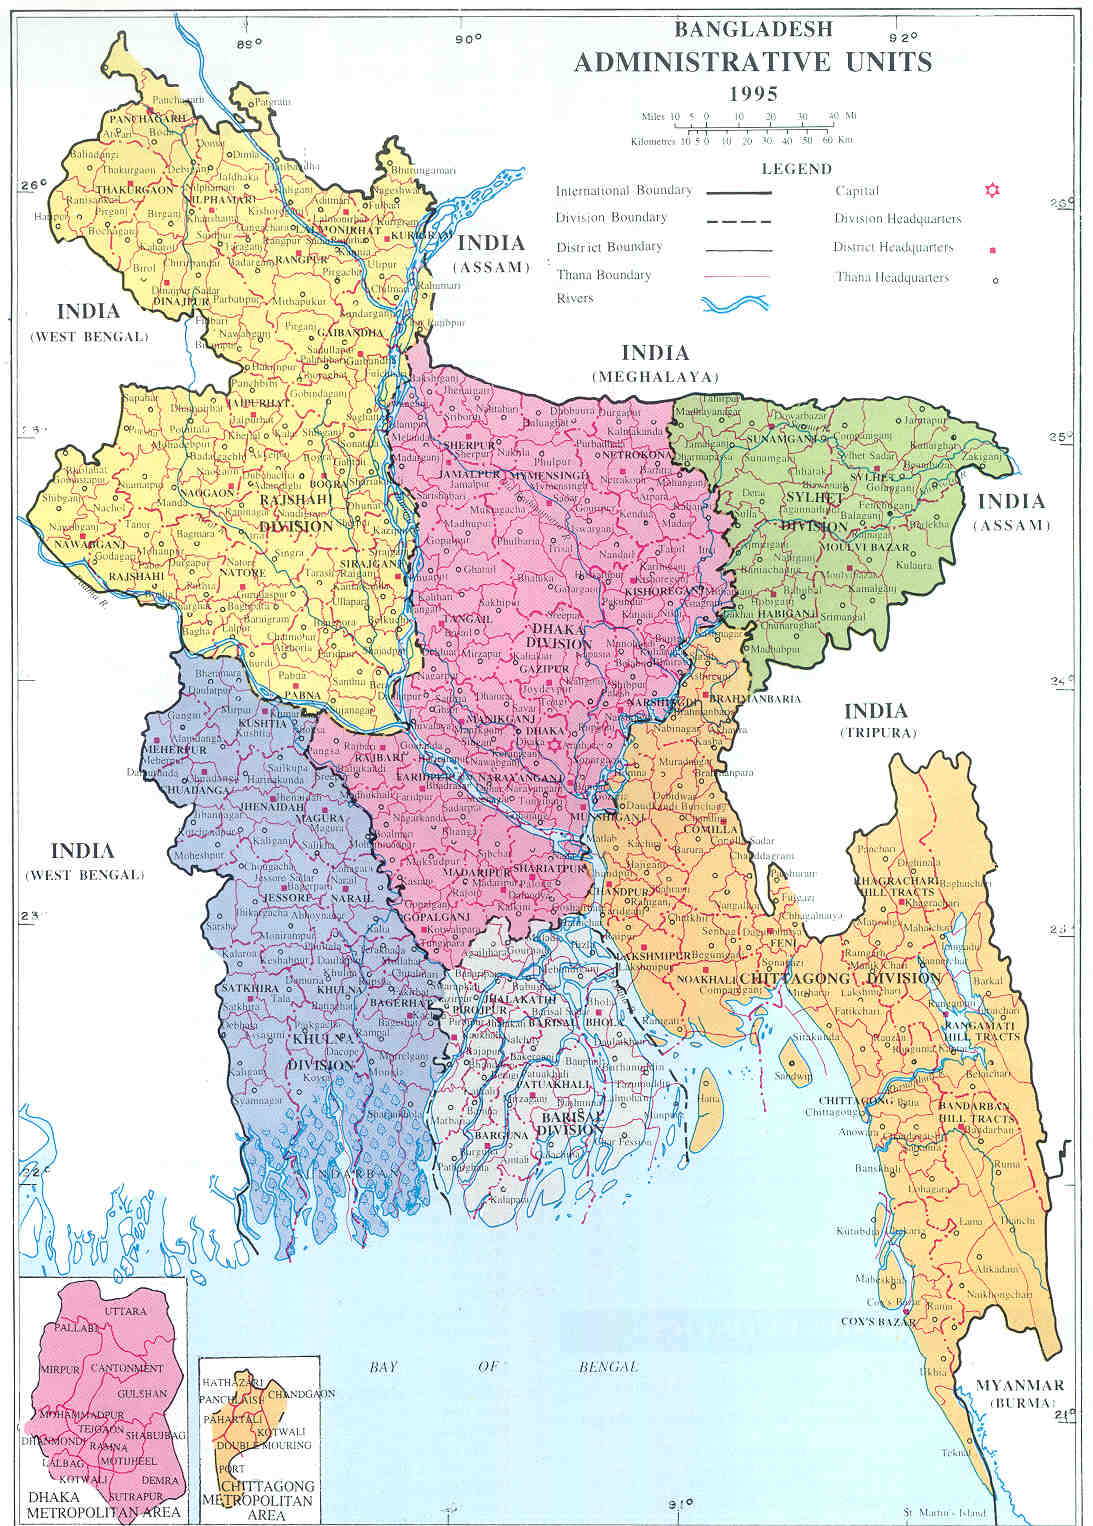 Maps Of Bangladesh Map Library Maps Of The World - Bangladesh map